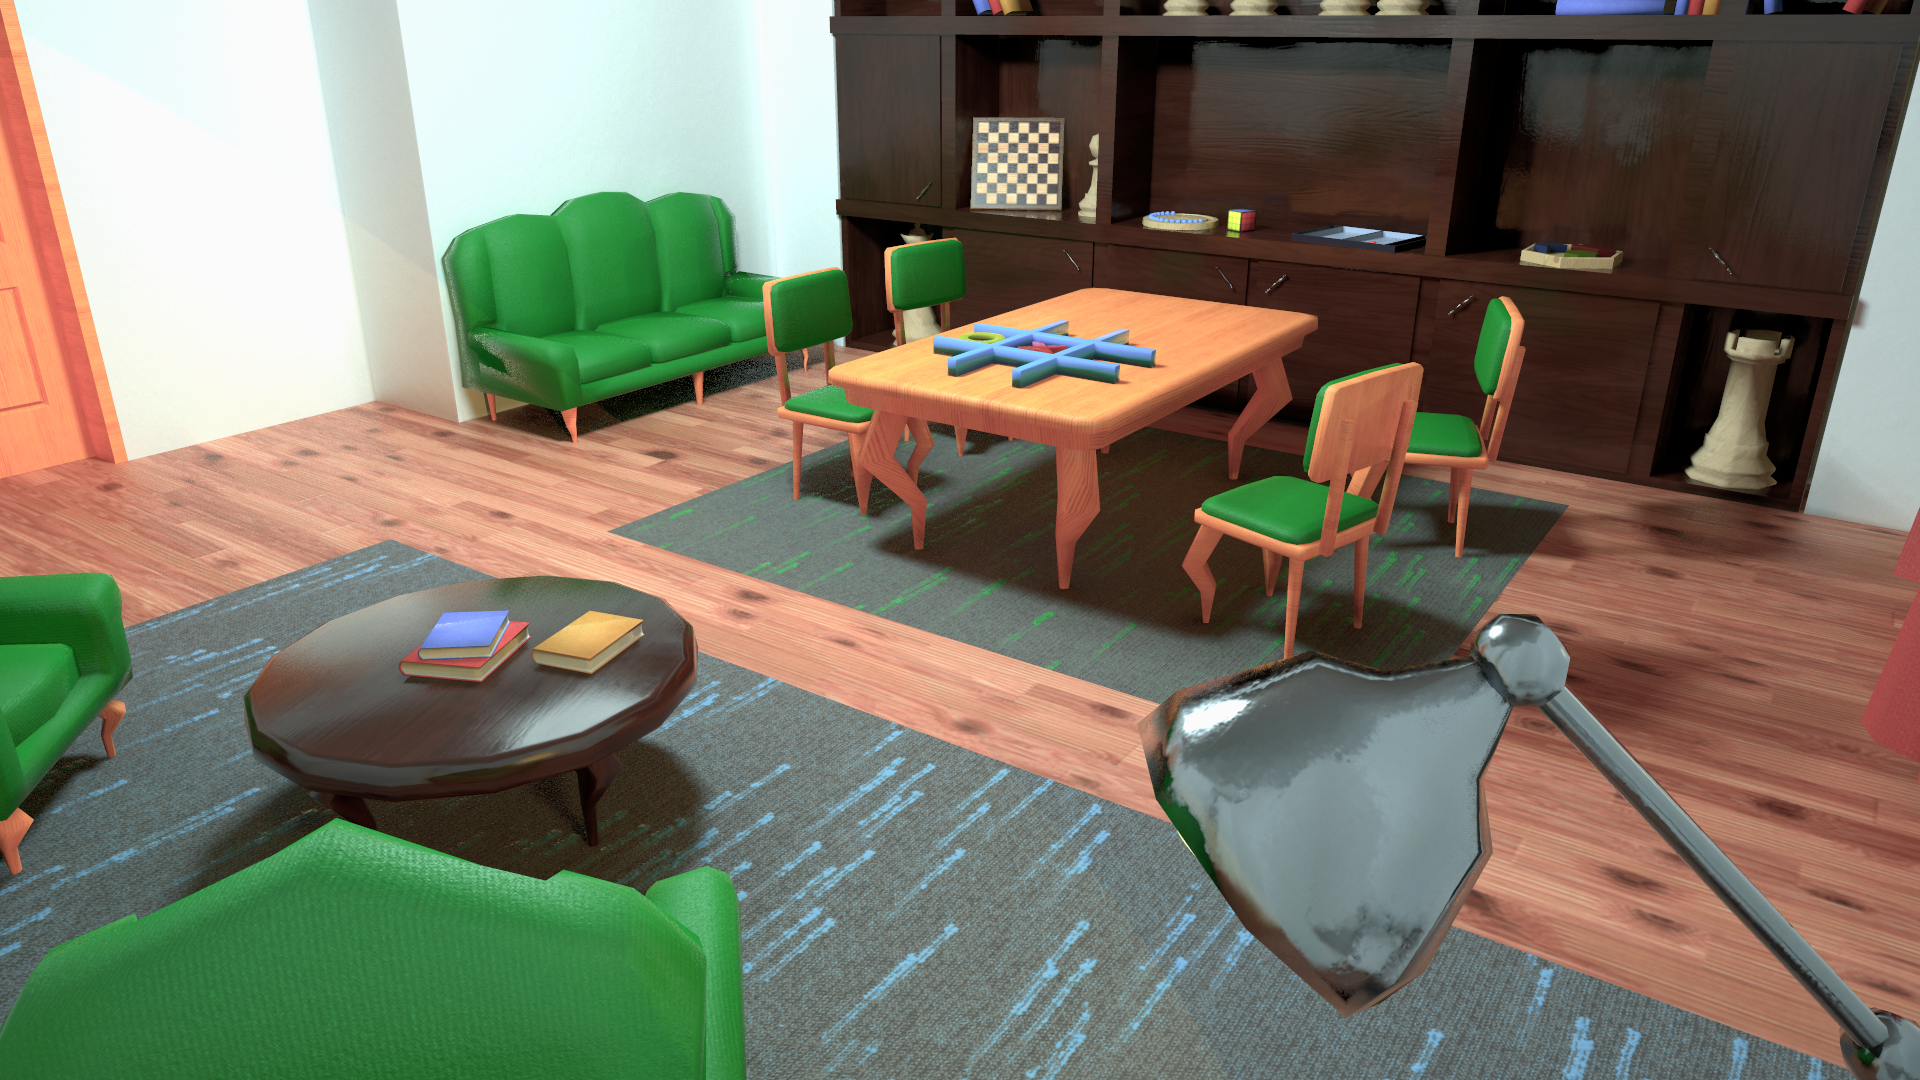 Udacity VR NanoDegree: Concentration 1 Mobile Performance & 360 Media